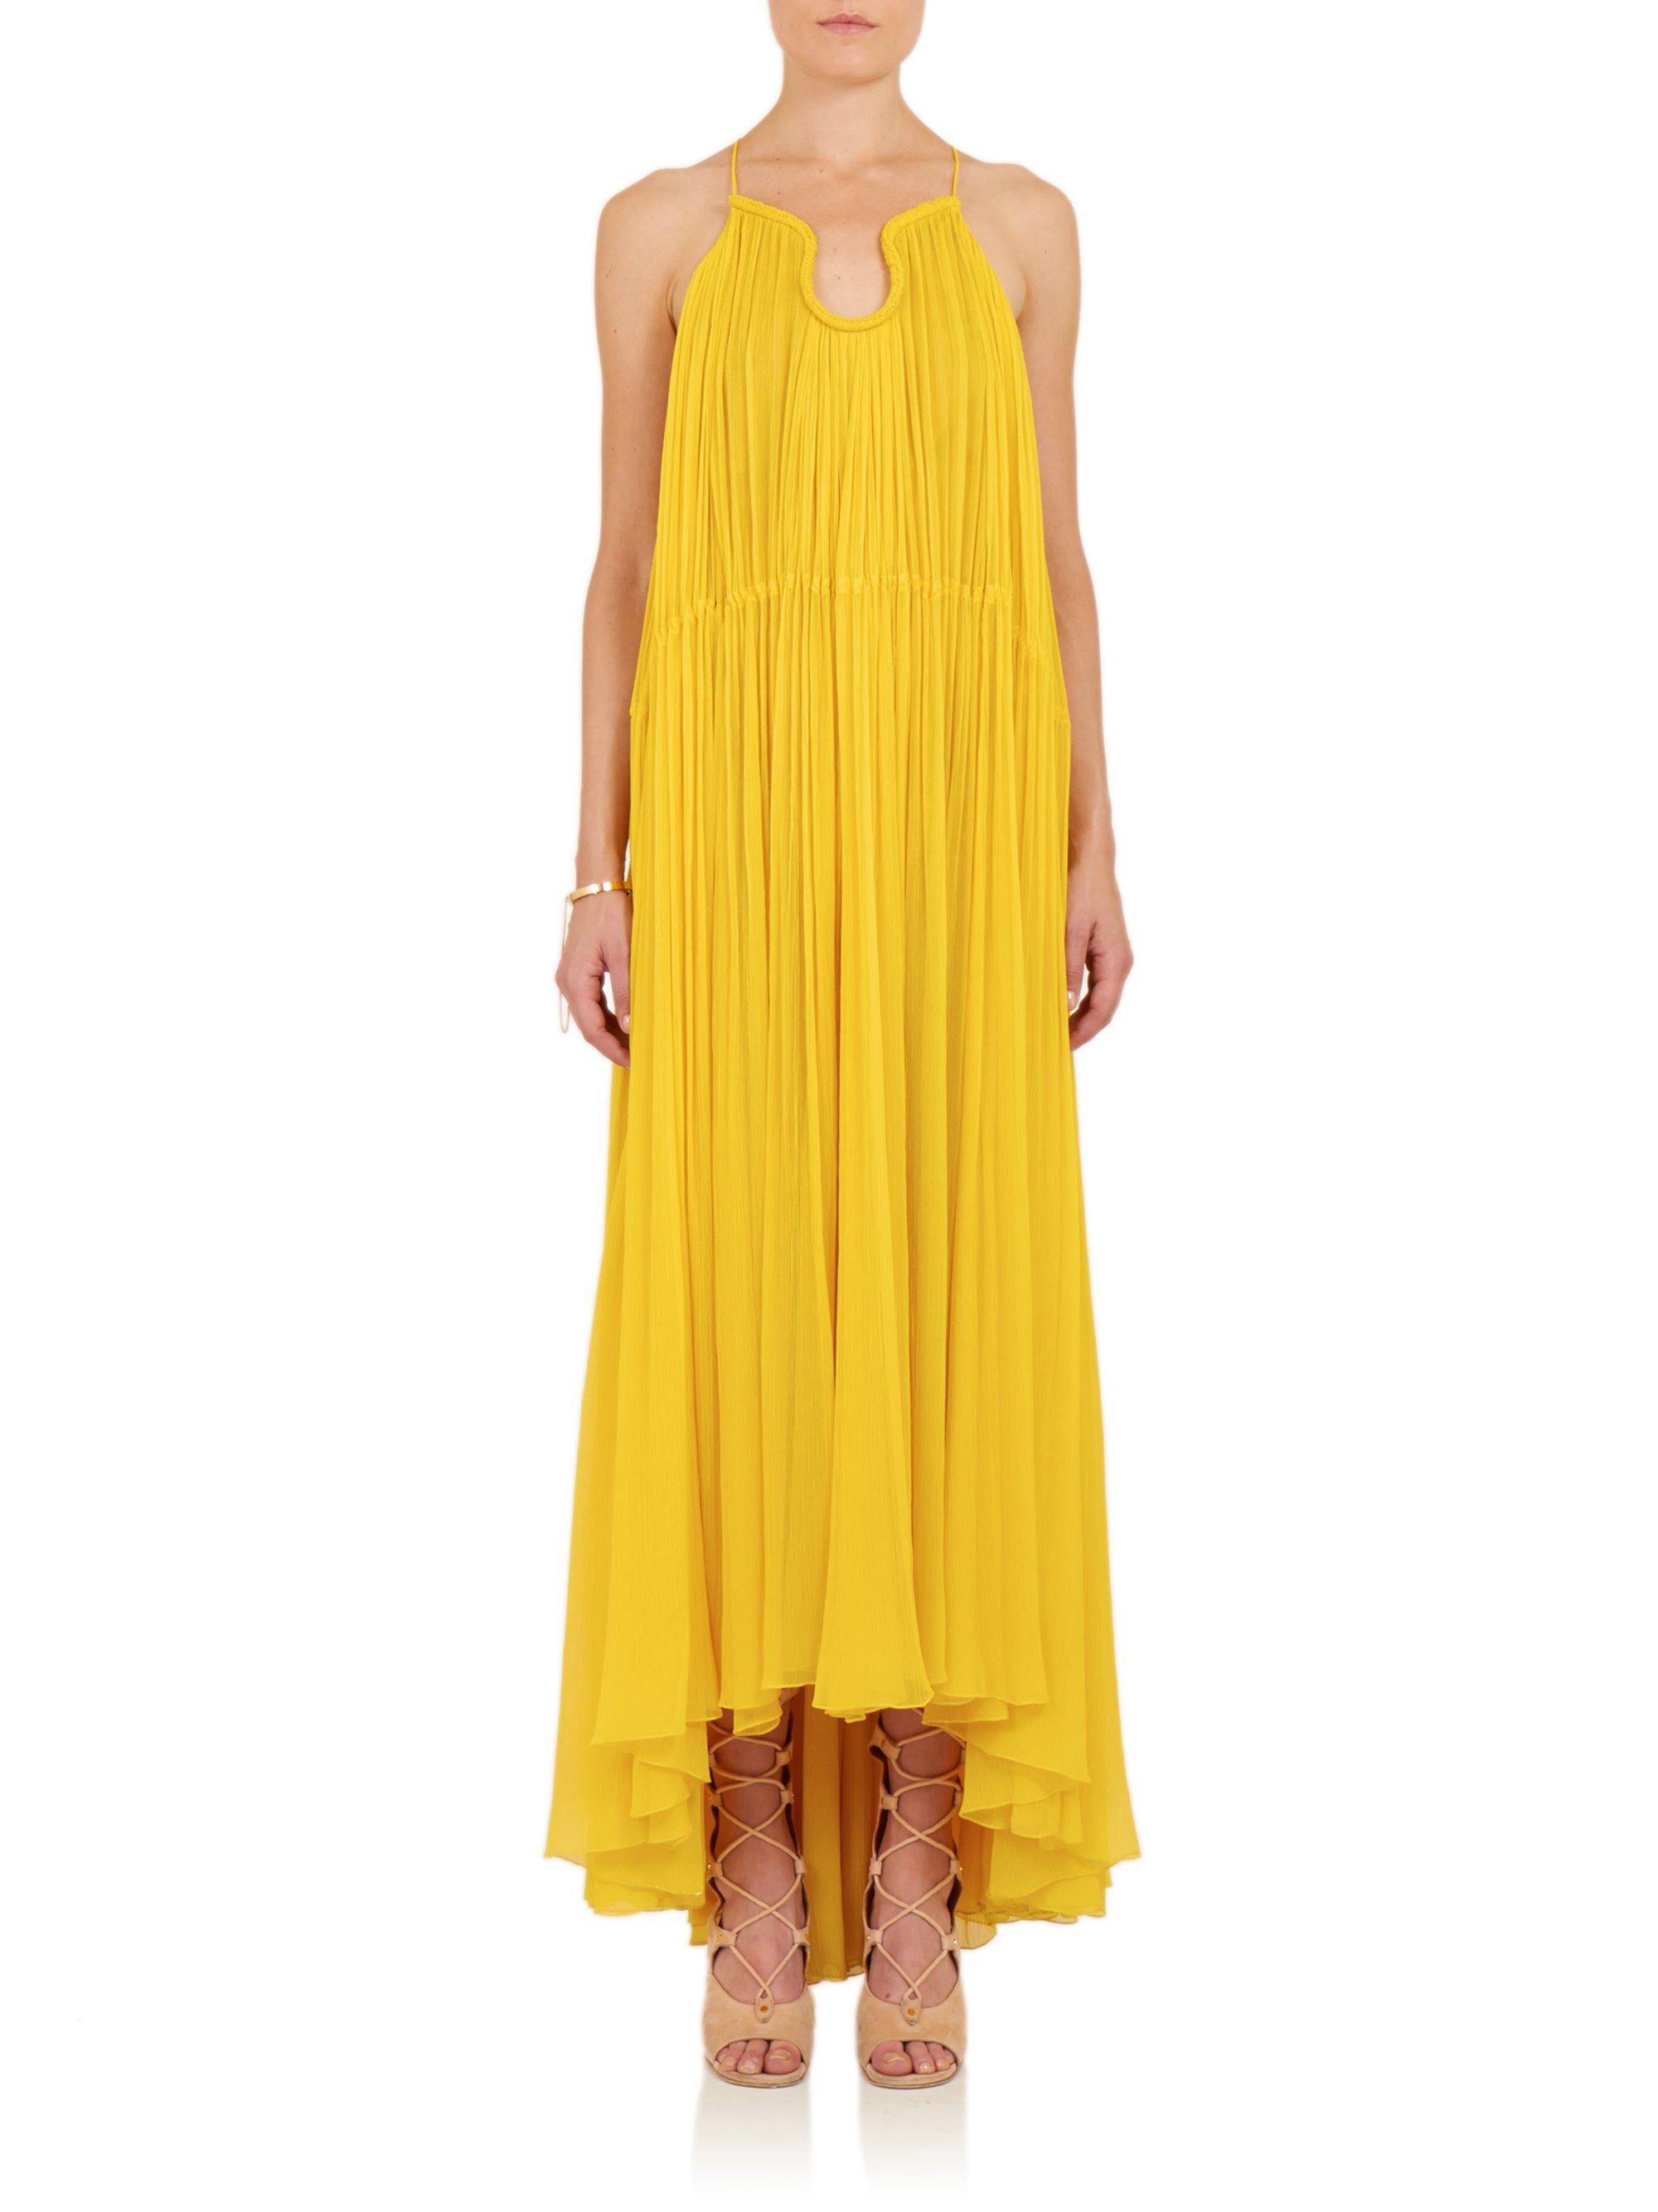 Chloé Pleated Silk Maxi Dress in Yellow | Lyst